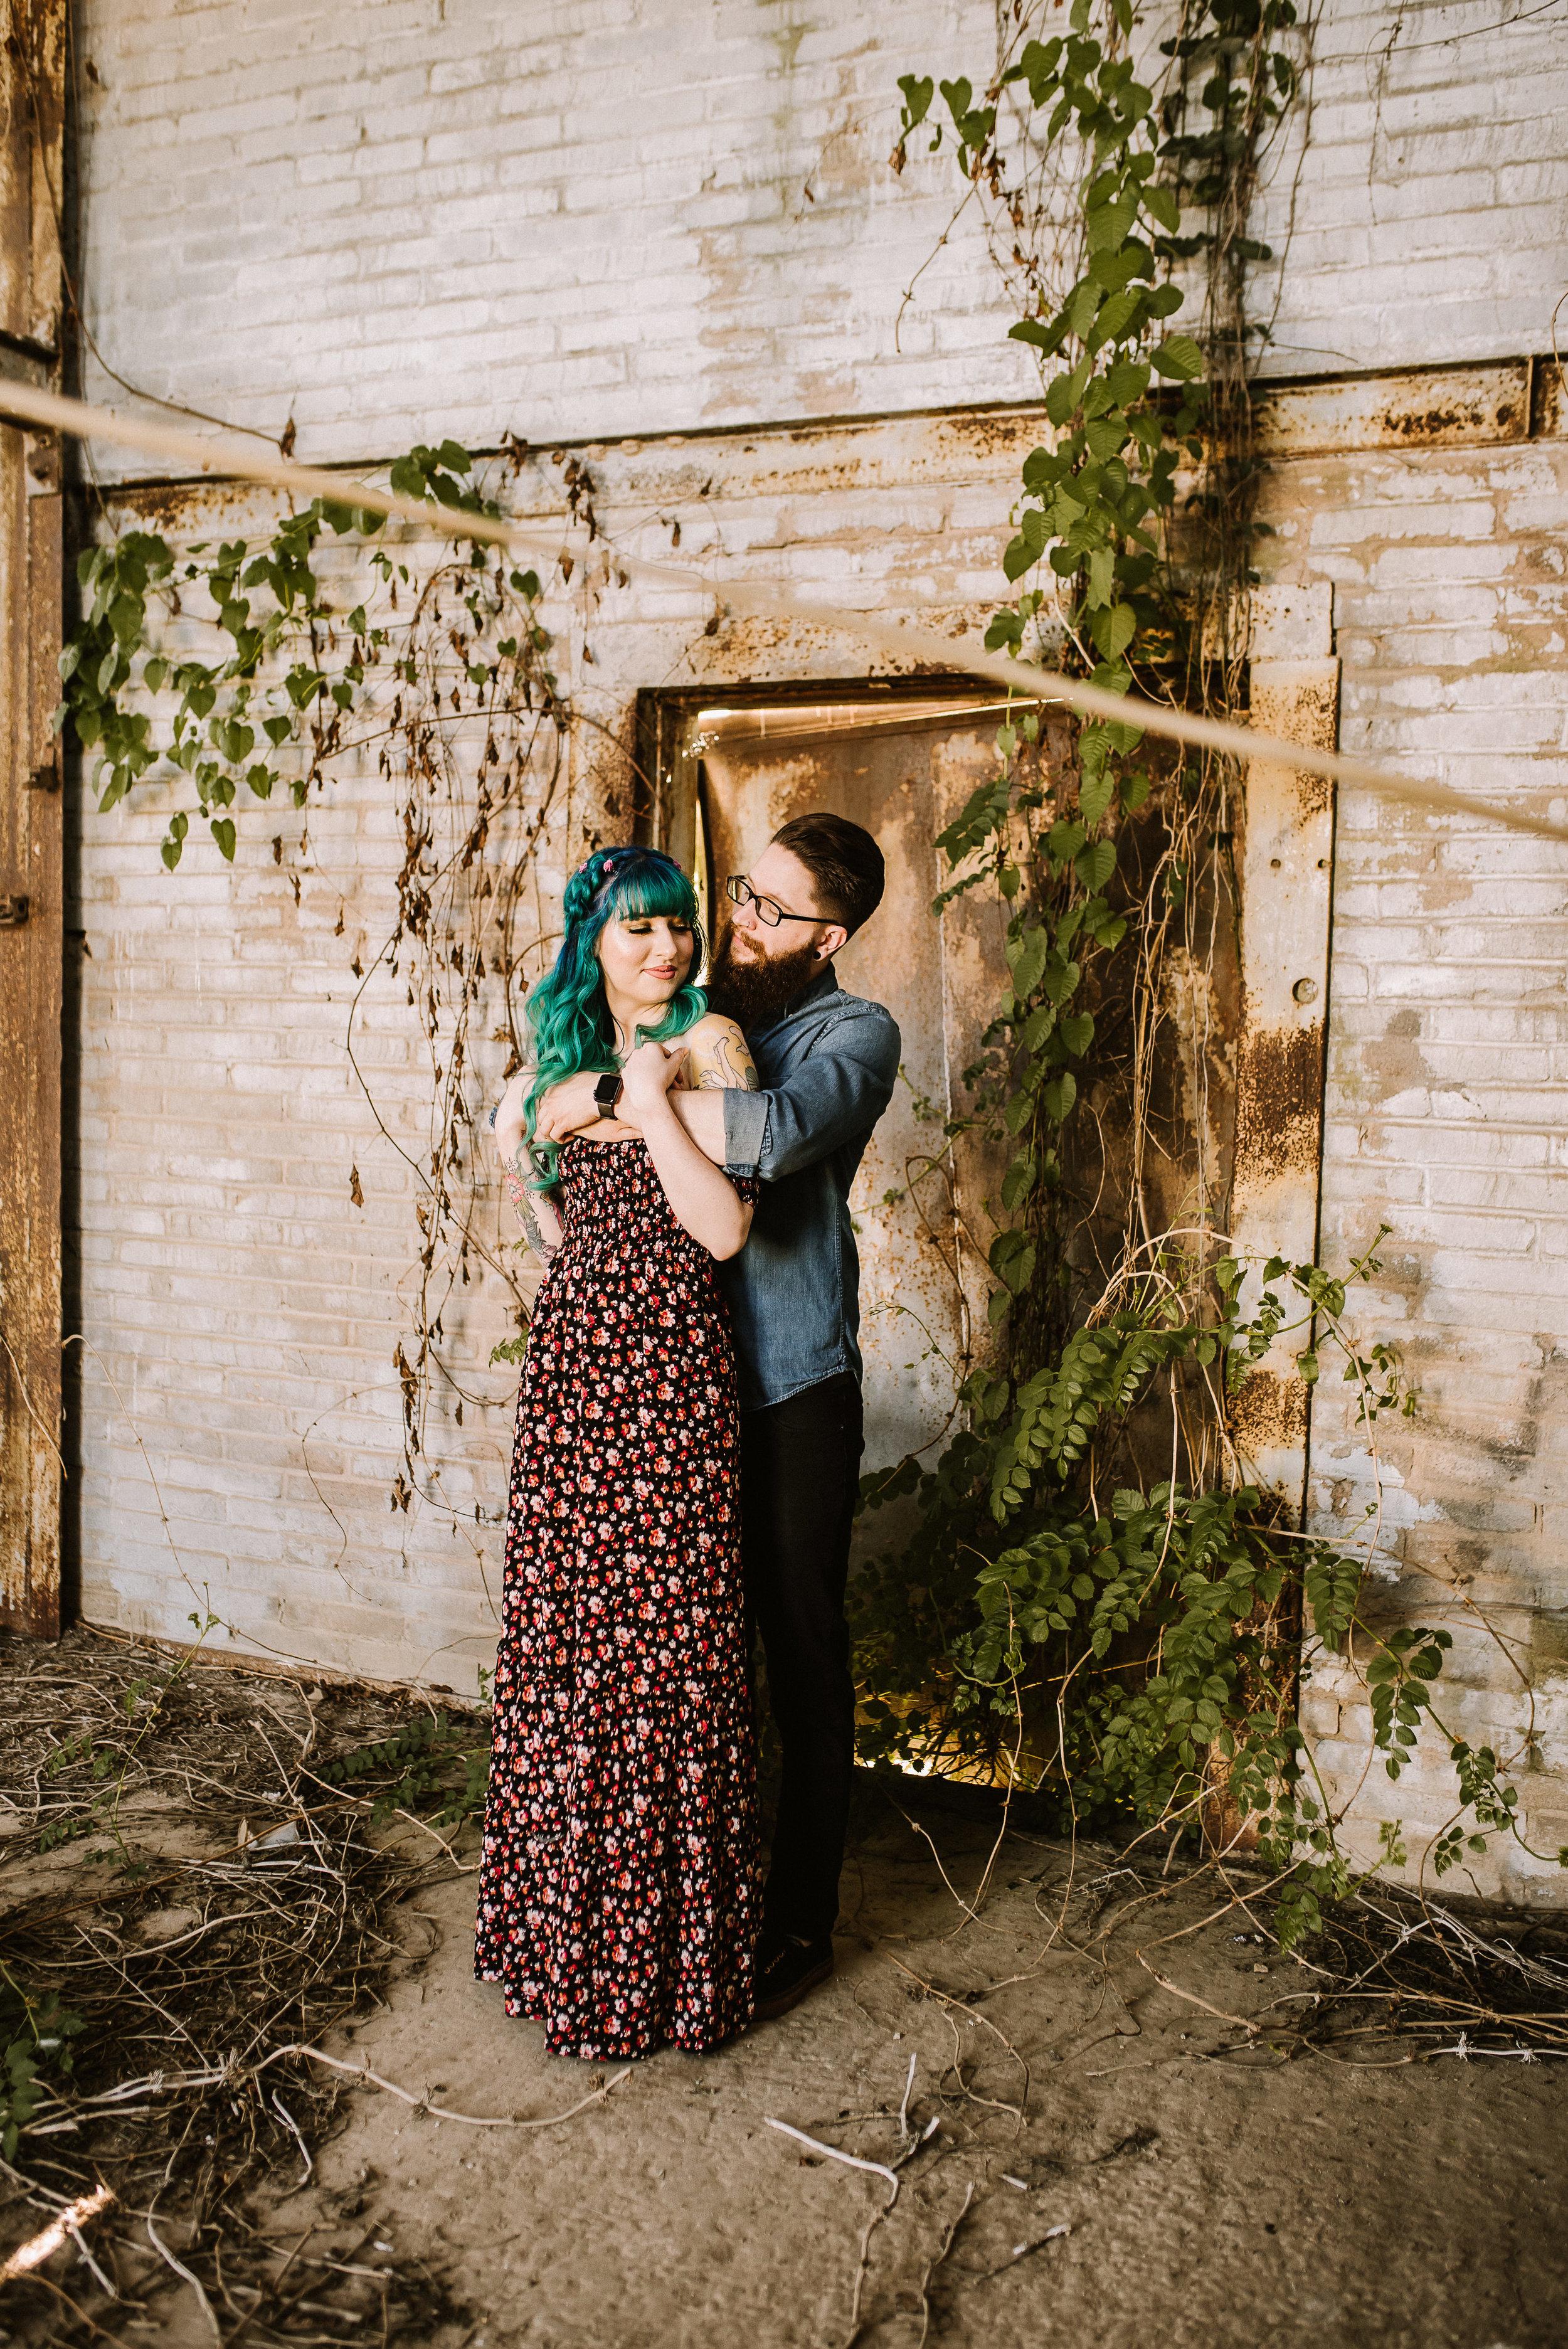 Kelly & Matt_Engagement Session_Wilson Arkansas_Ashley Benham Photography-52.jpg